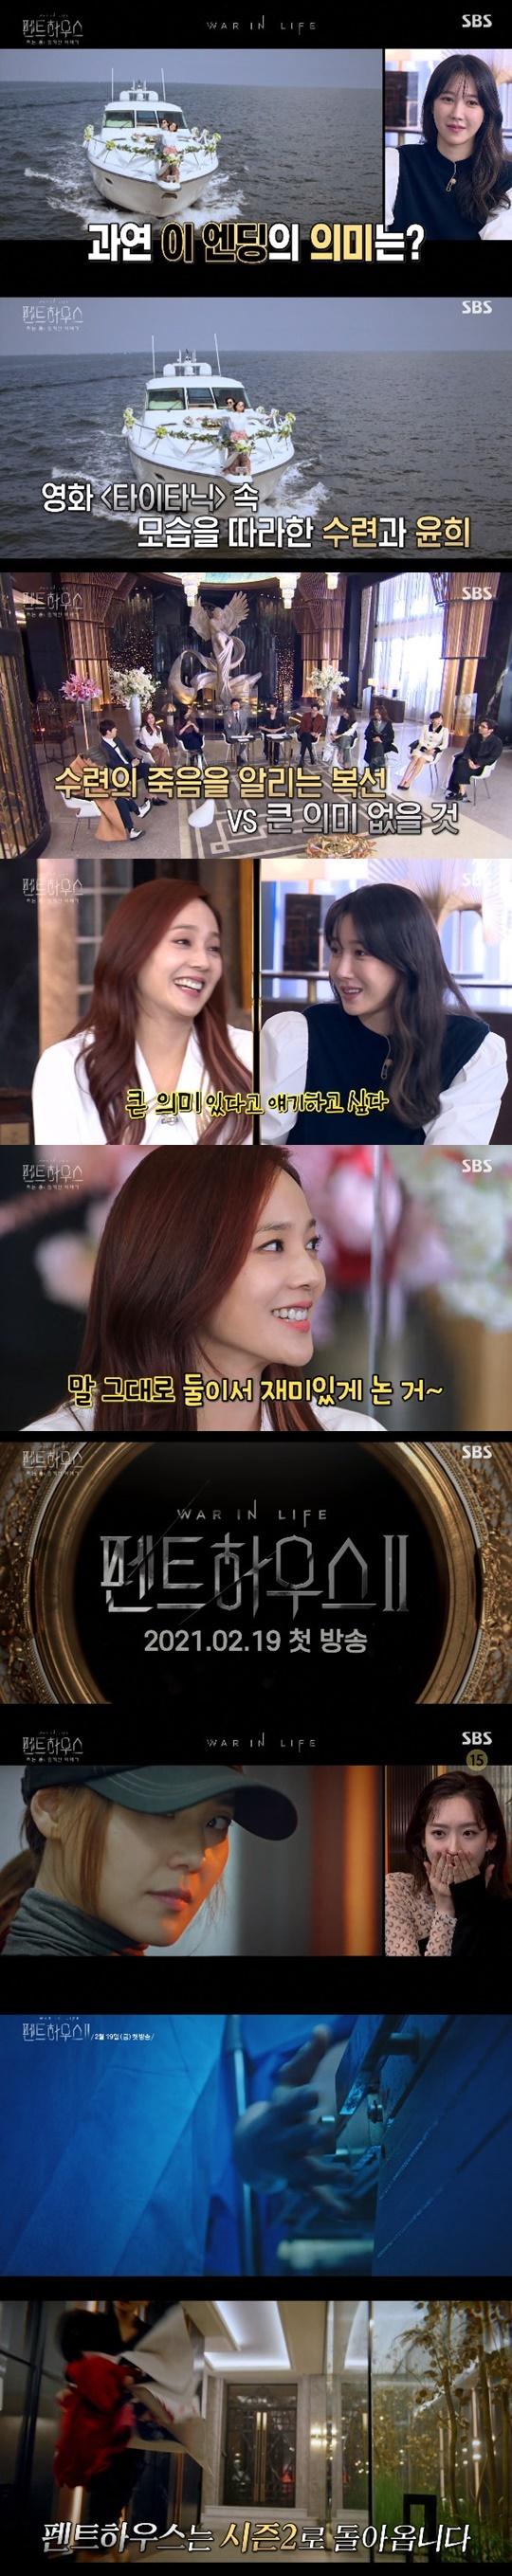 [RE:TV] '펜트 하우스 히든 룸'유진 x 지아, 요트 씬 엔딩 비화 공개 … 시즌 2 영상 선공개